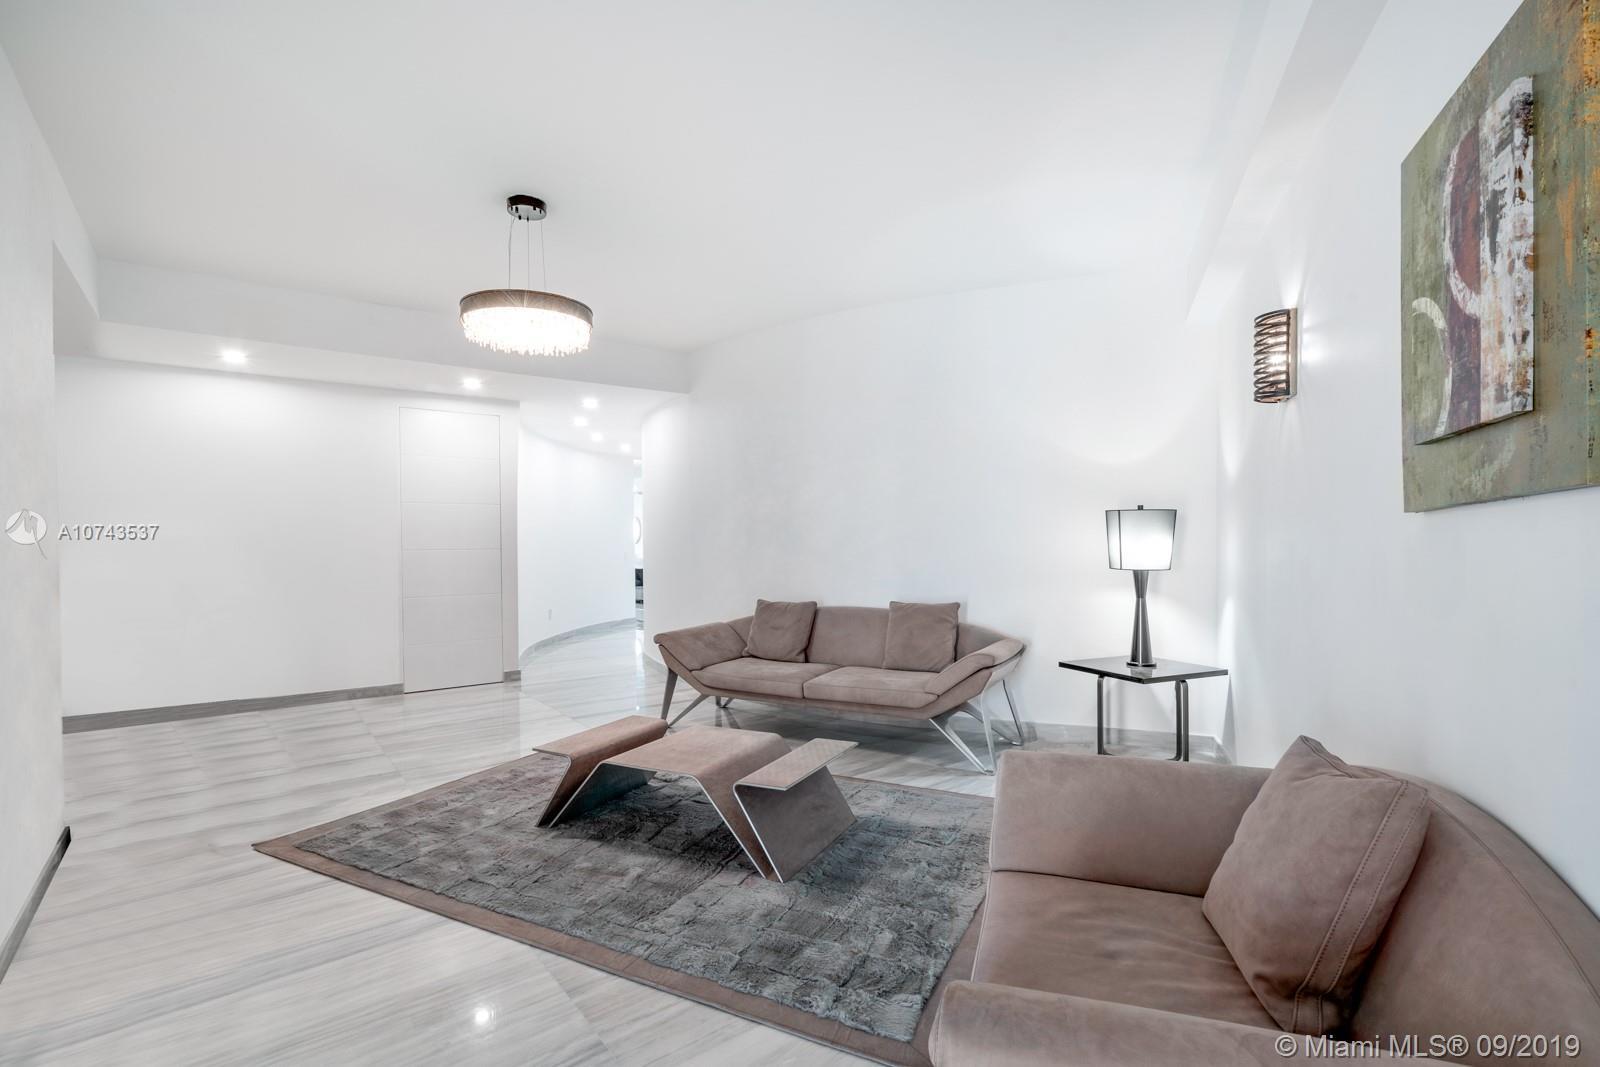 Аренда квартиры по адресу 18555 Collins Ave, Sunny Isles Beach, FL 33160 в США